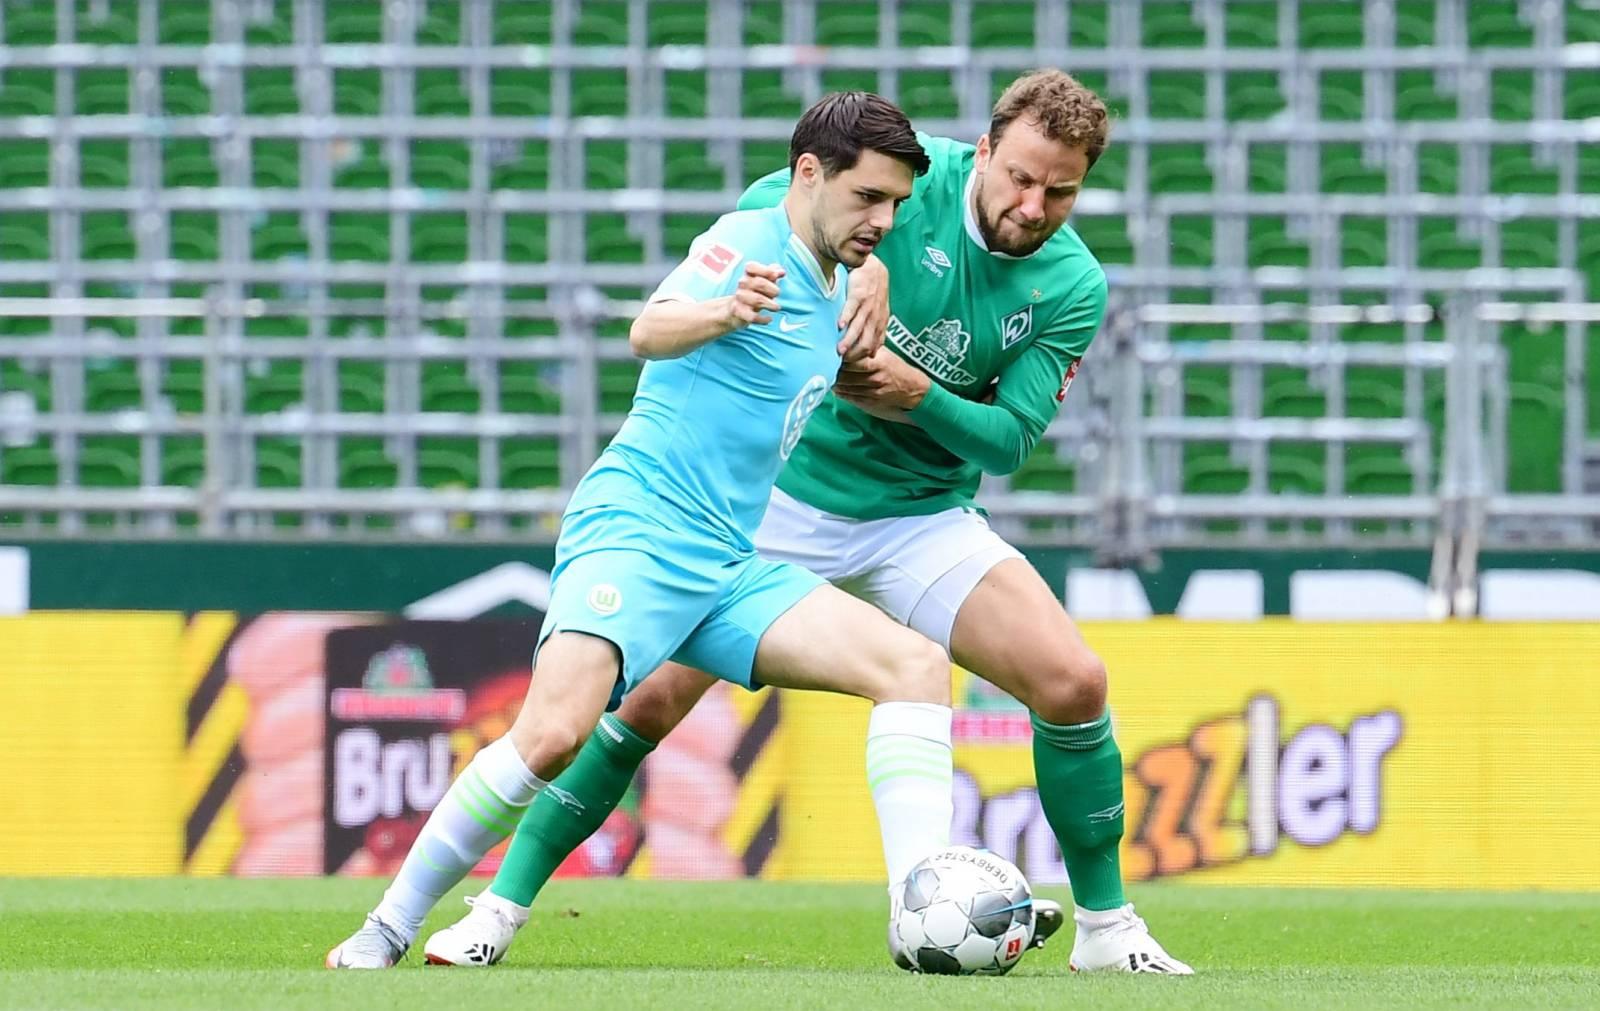 firo, football: 07.06.2020 1.Bundesliga, season 19/20 2019/2020 30th matchday: SV Werder Bremen - VfL Wolfsburg